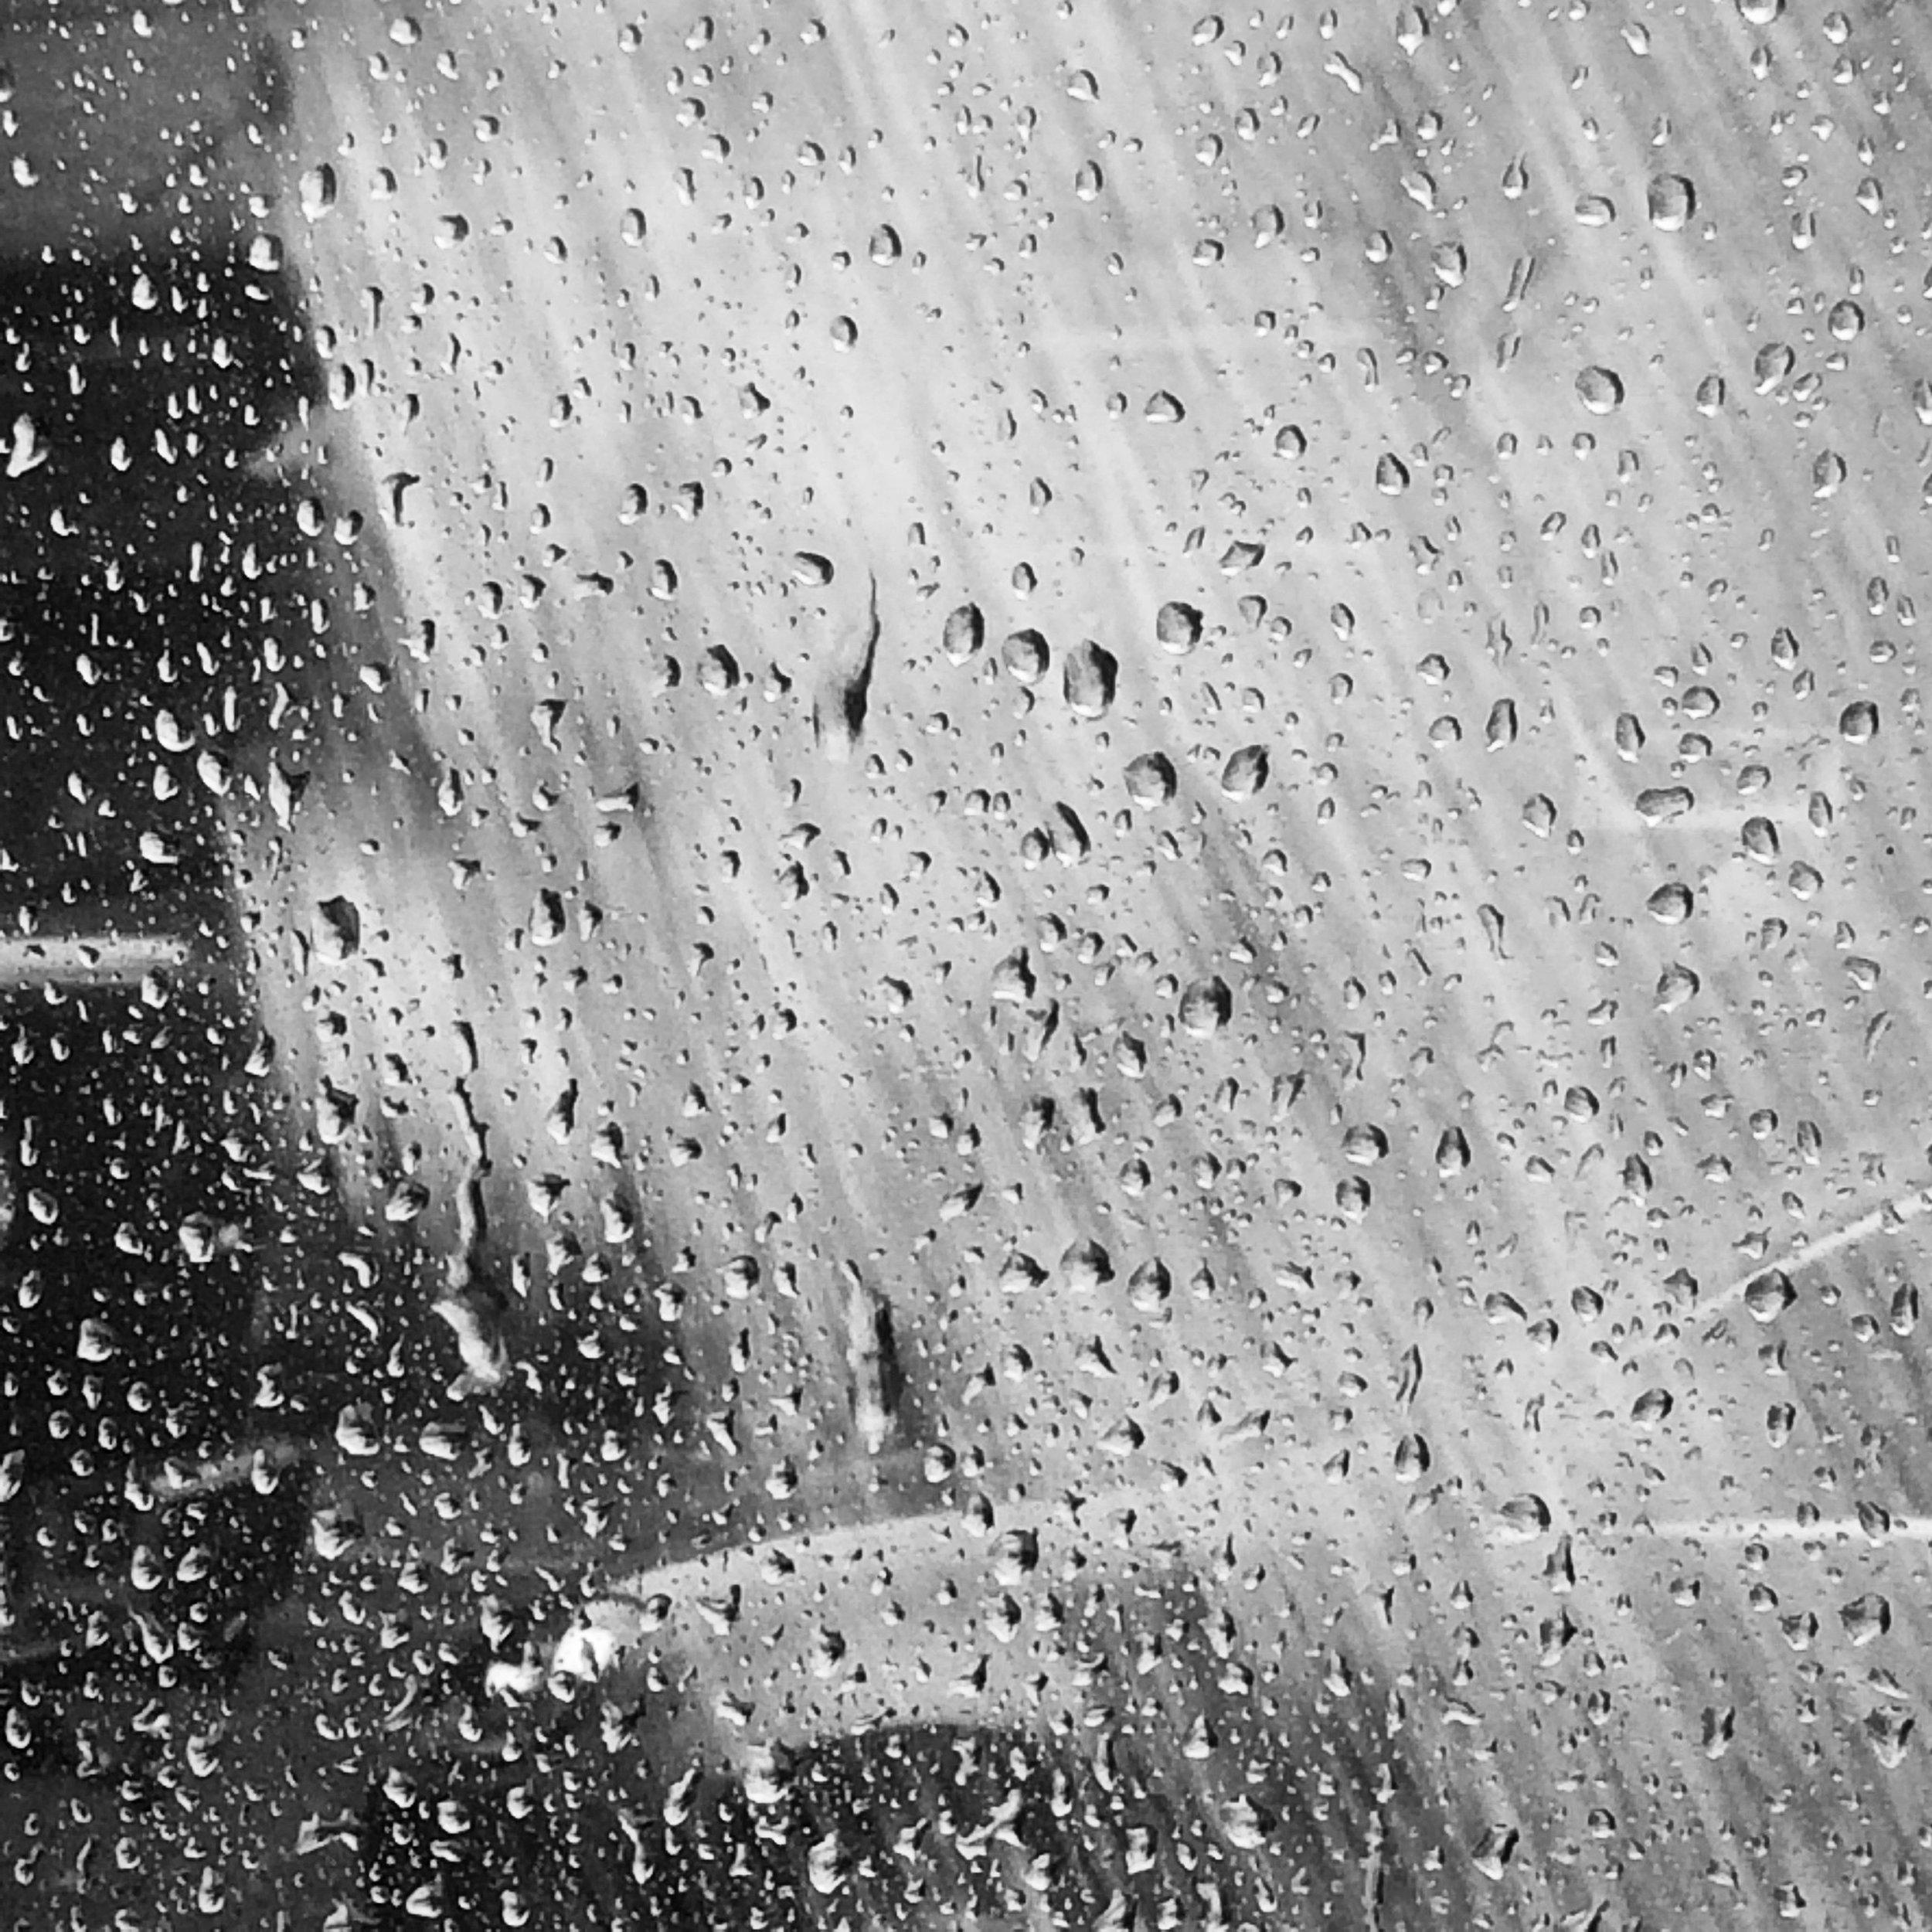 cab under the rain20*20.jpg